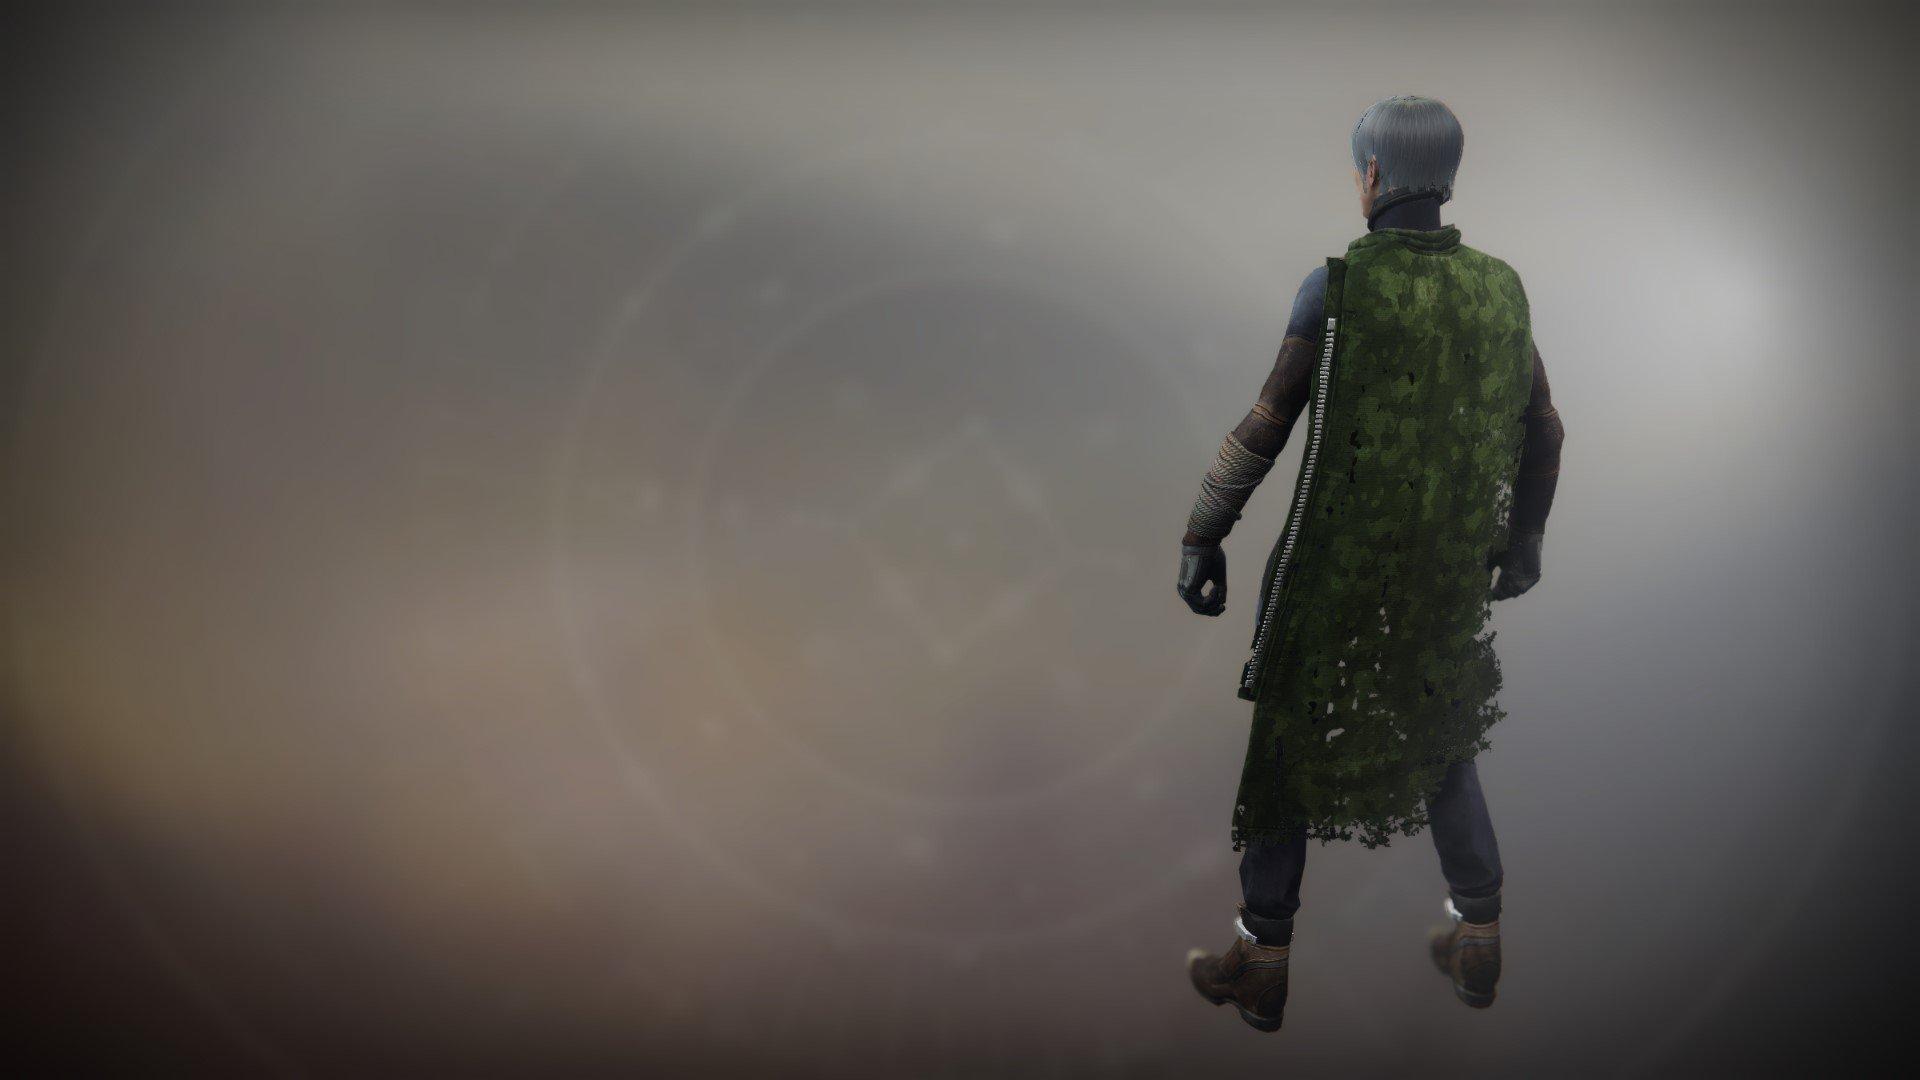 An in-game render of the Wildwood Cloak.